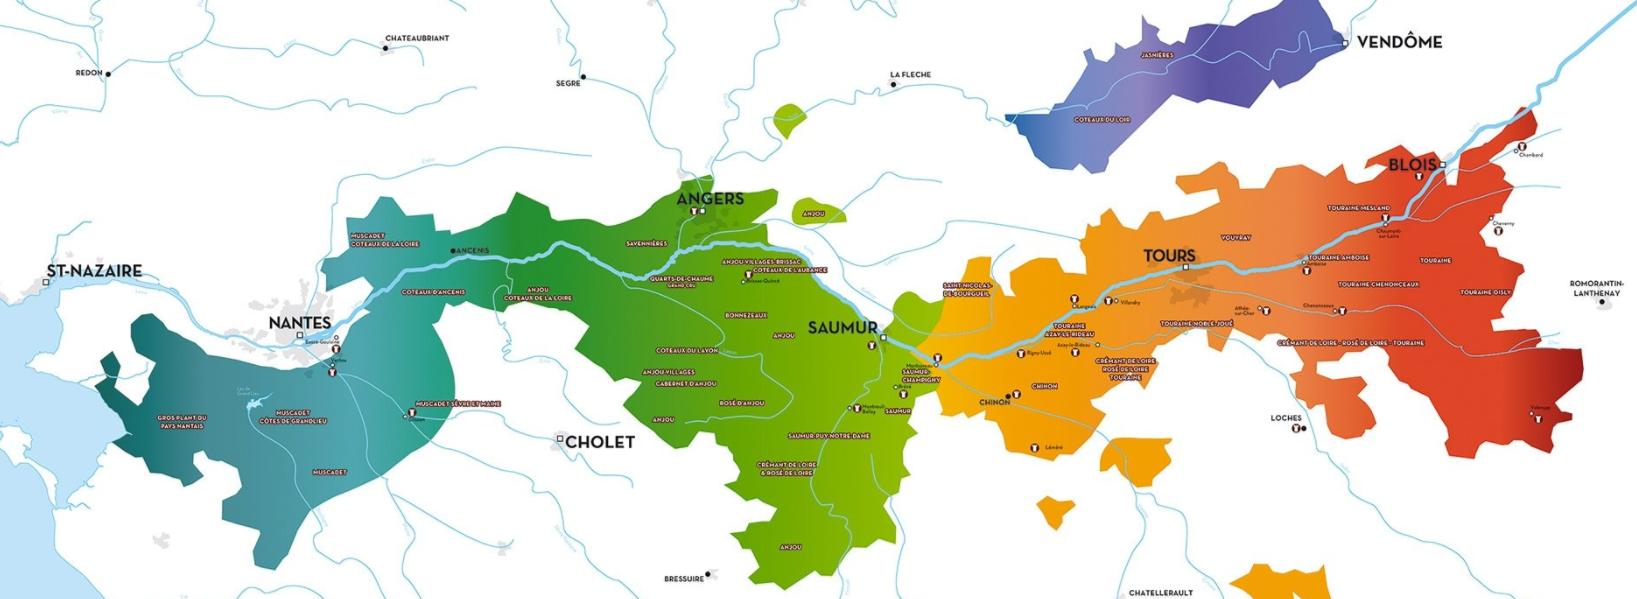 Vallée de la Loire